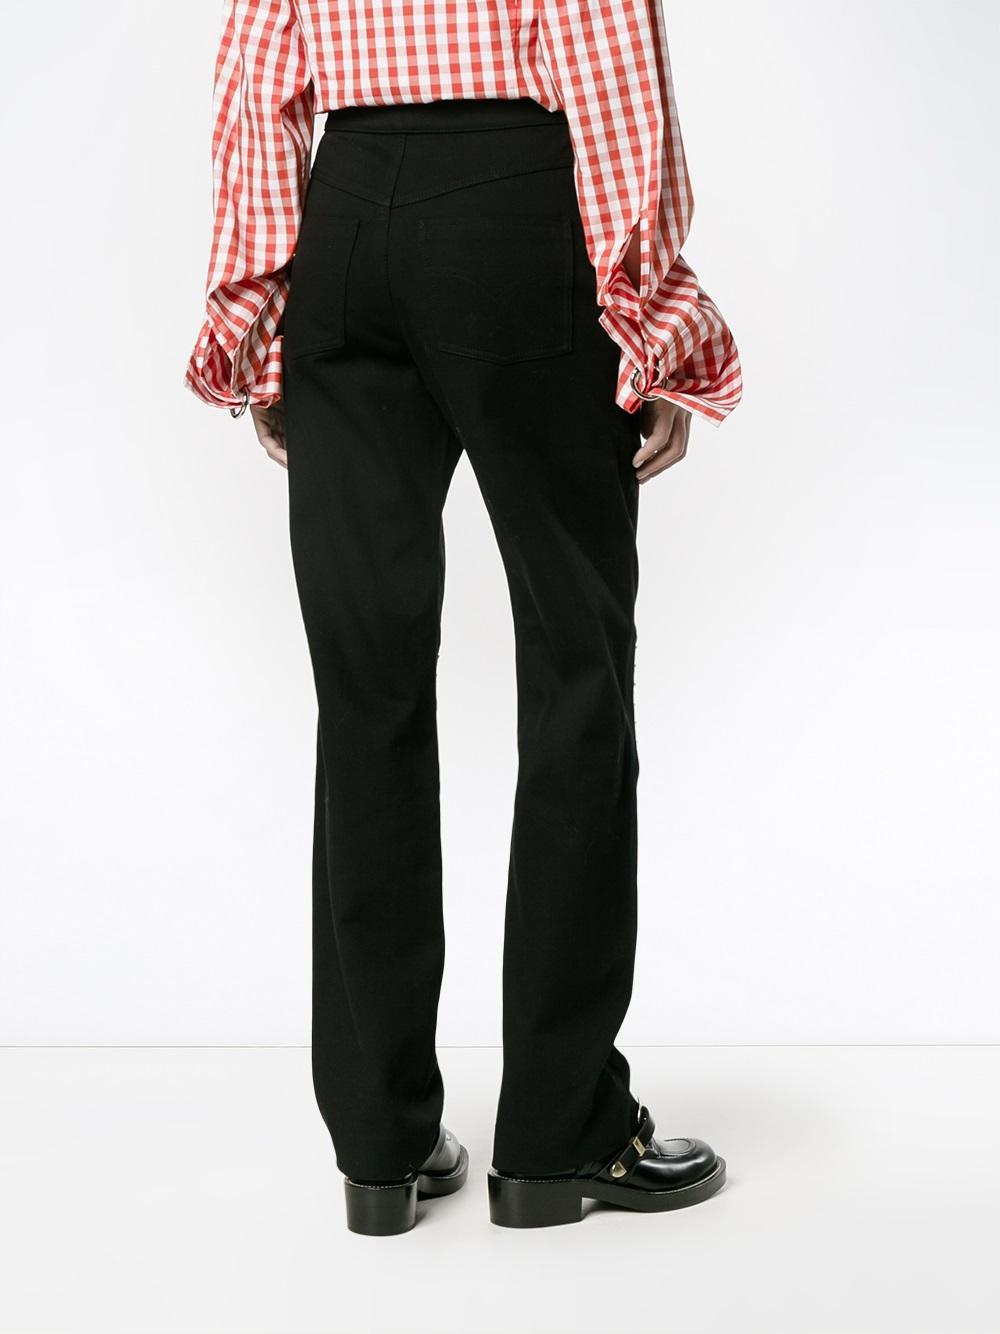 JW Anderson Denim Rounded Stud Knee Jeans in Black